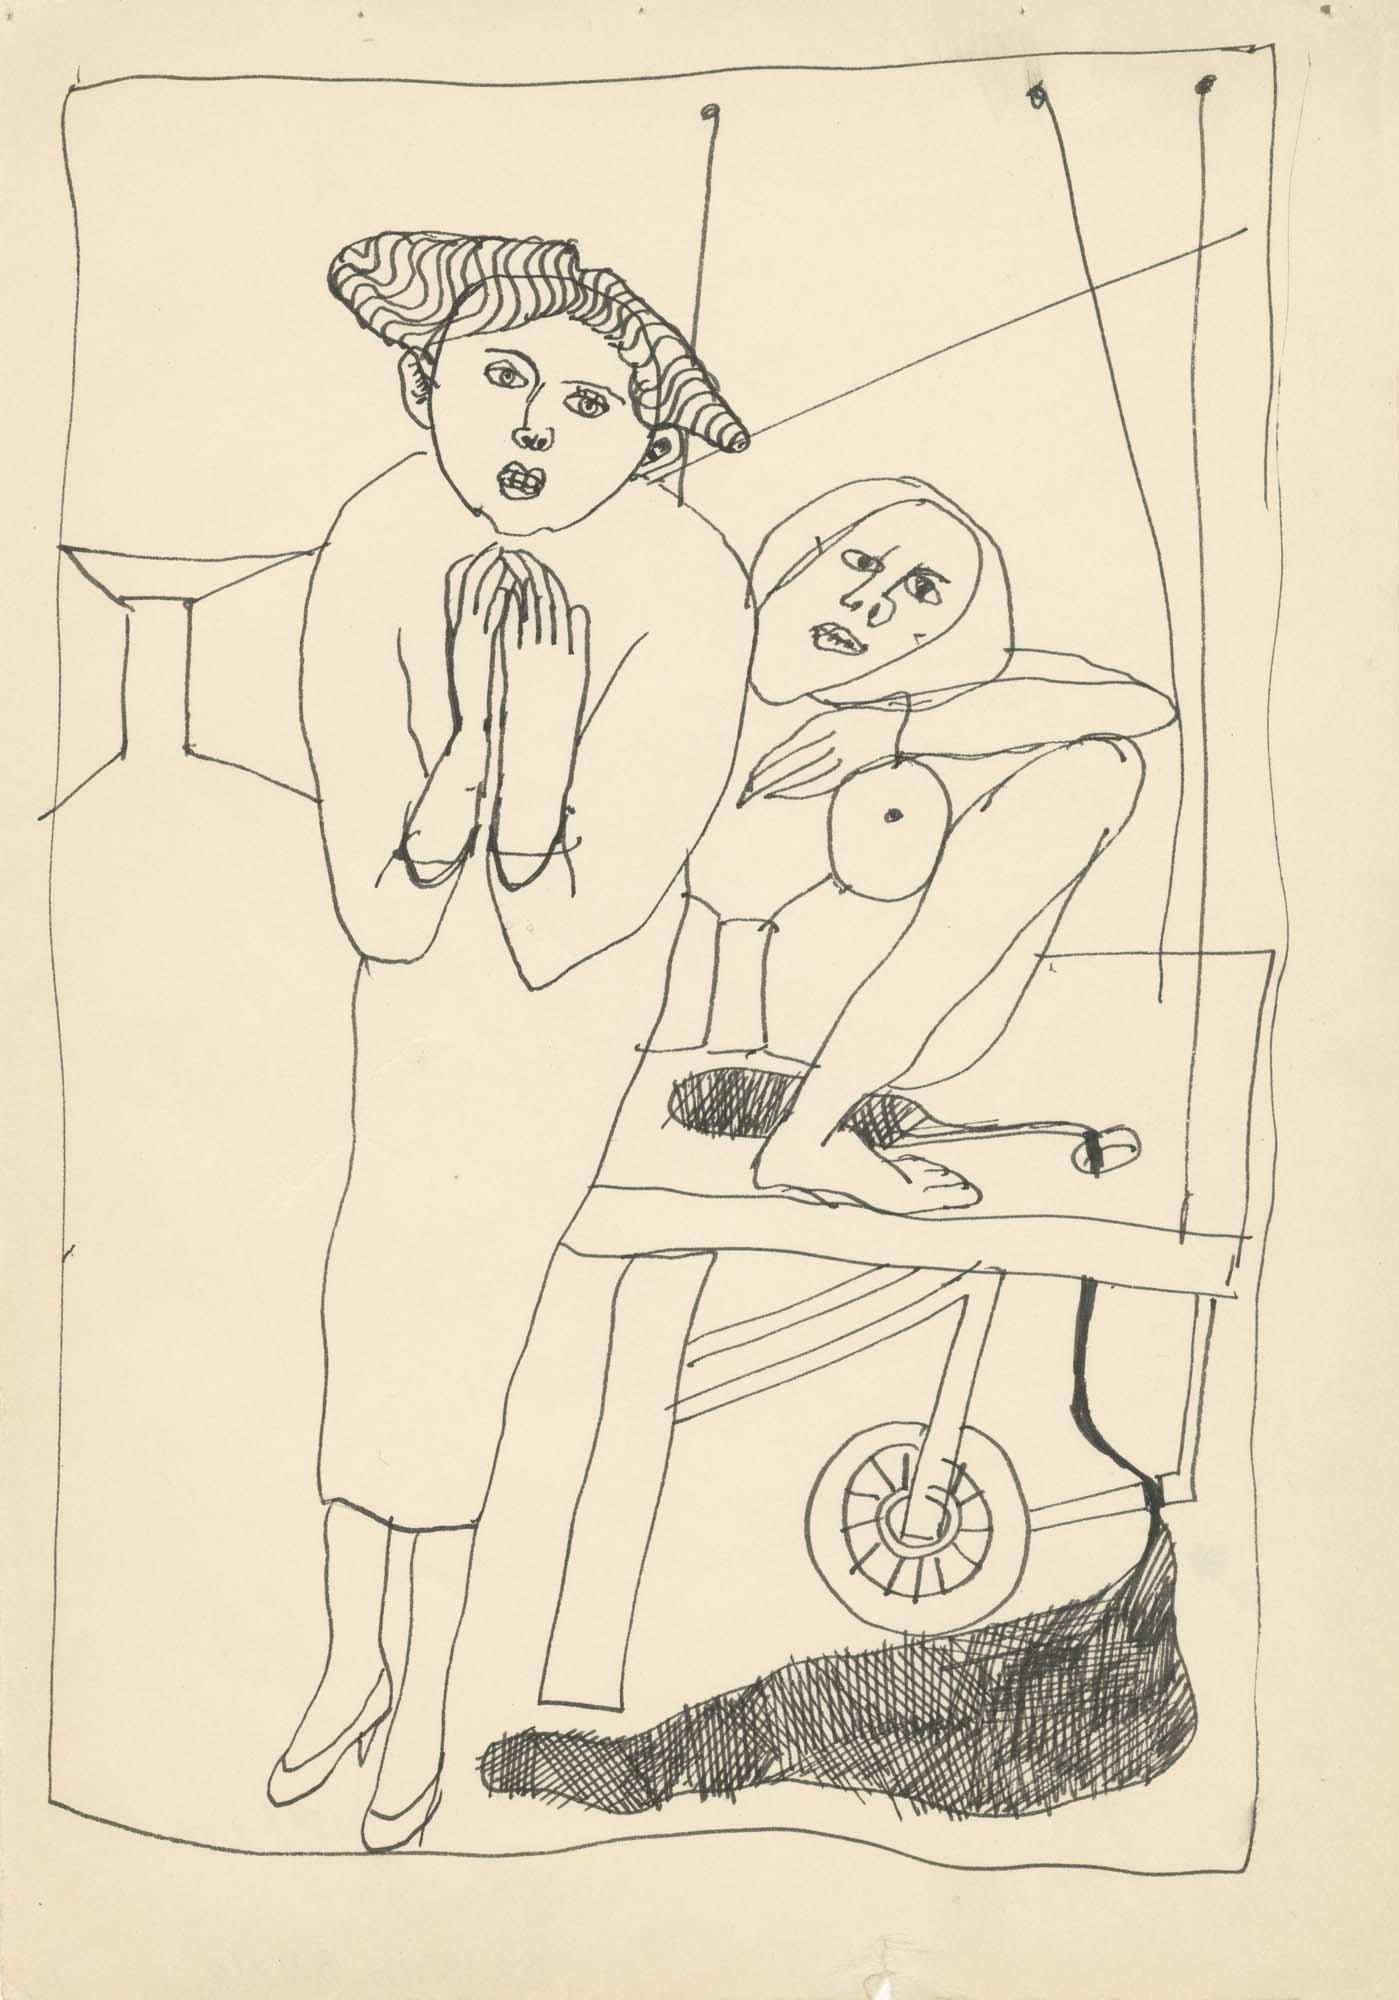 <i>Blood on the Sheets</i>, 1960